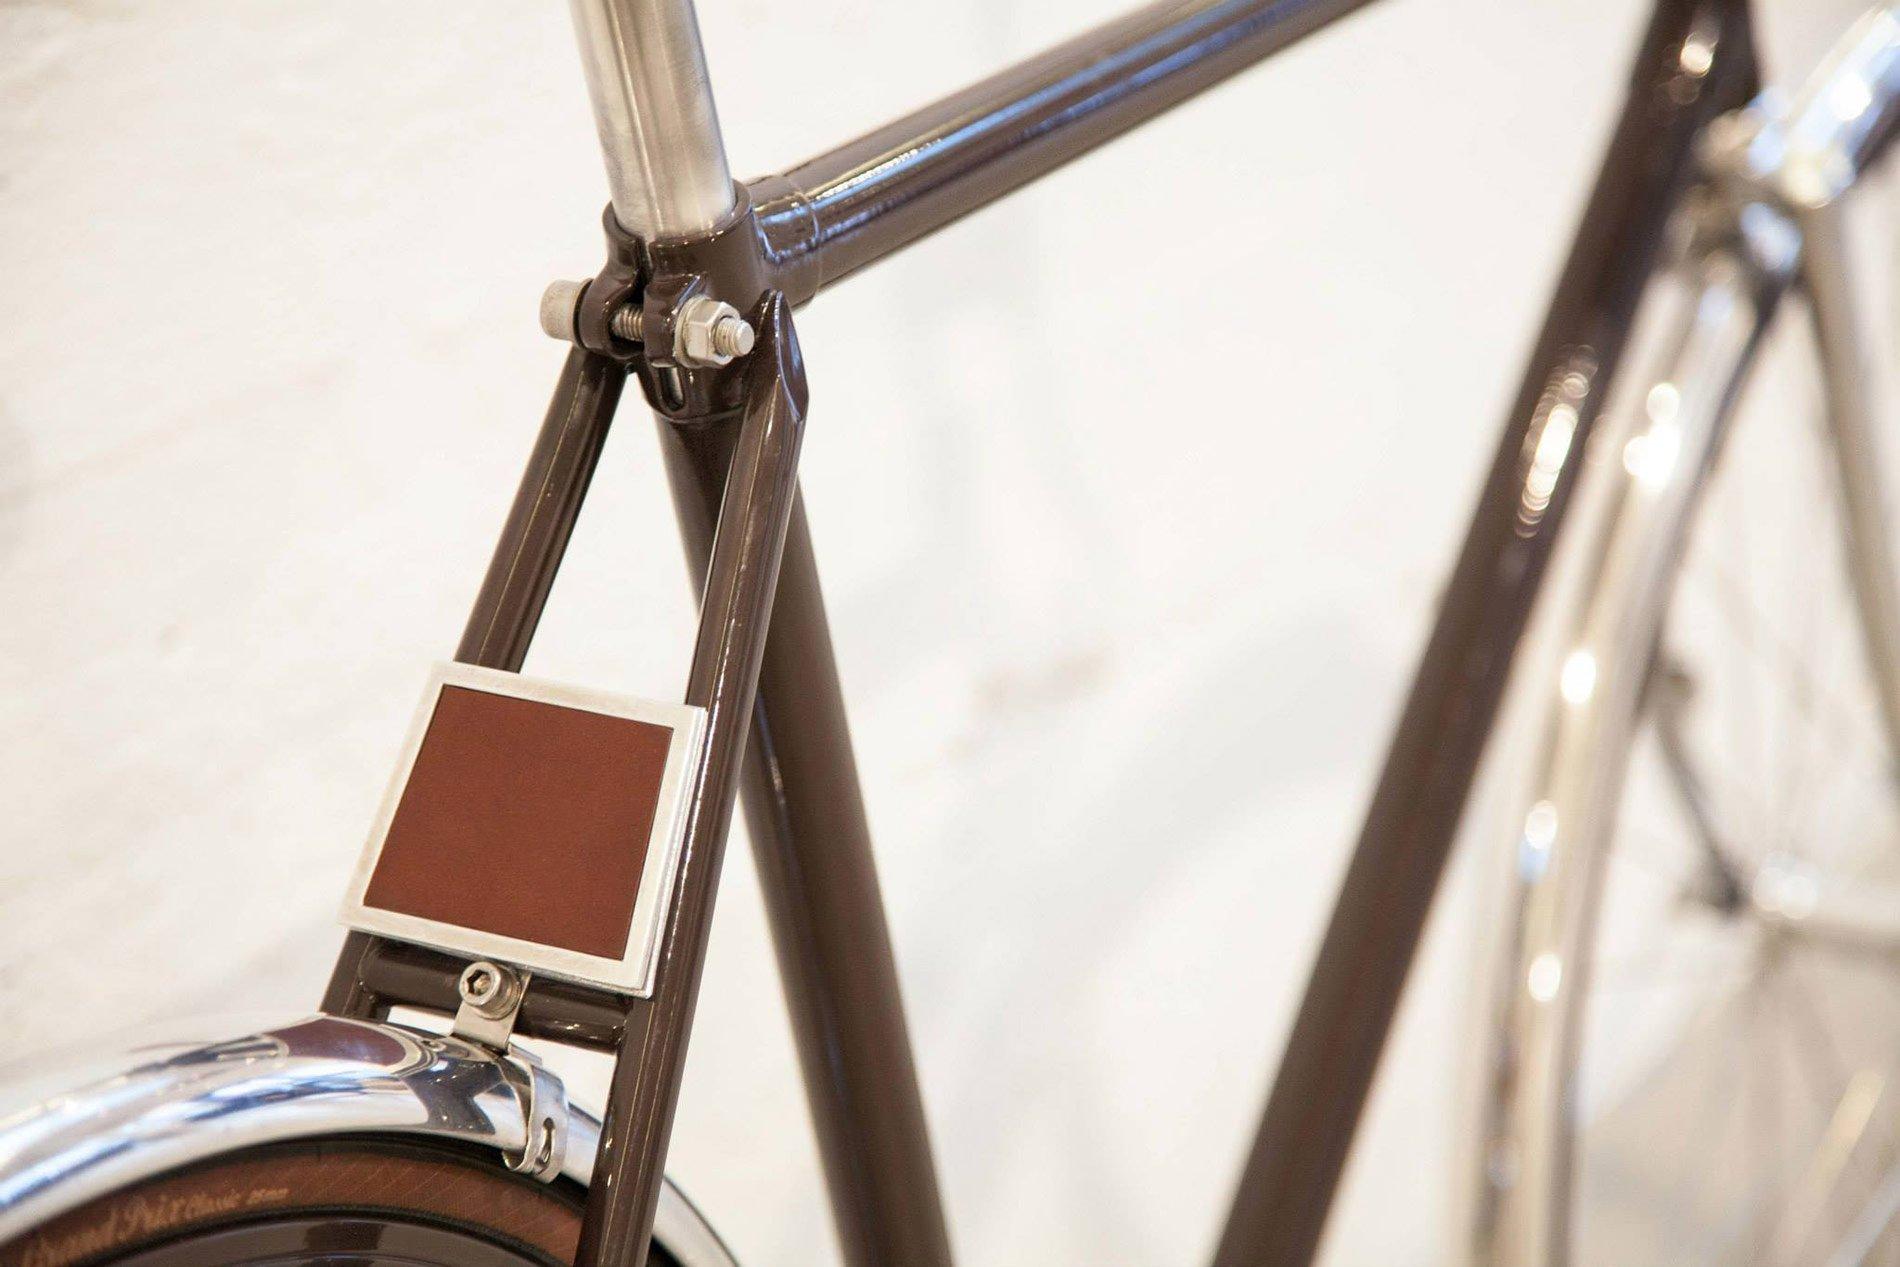 velorbis_fritz_hansen_urban_retro_bicycle_4